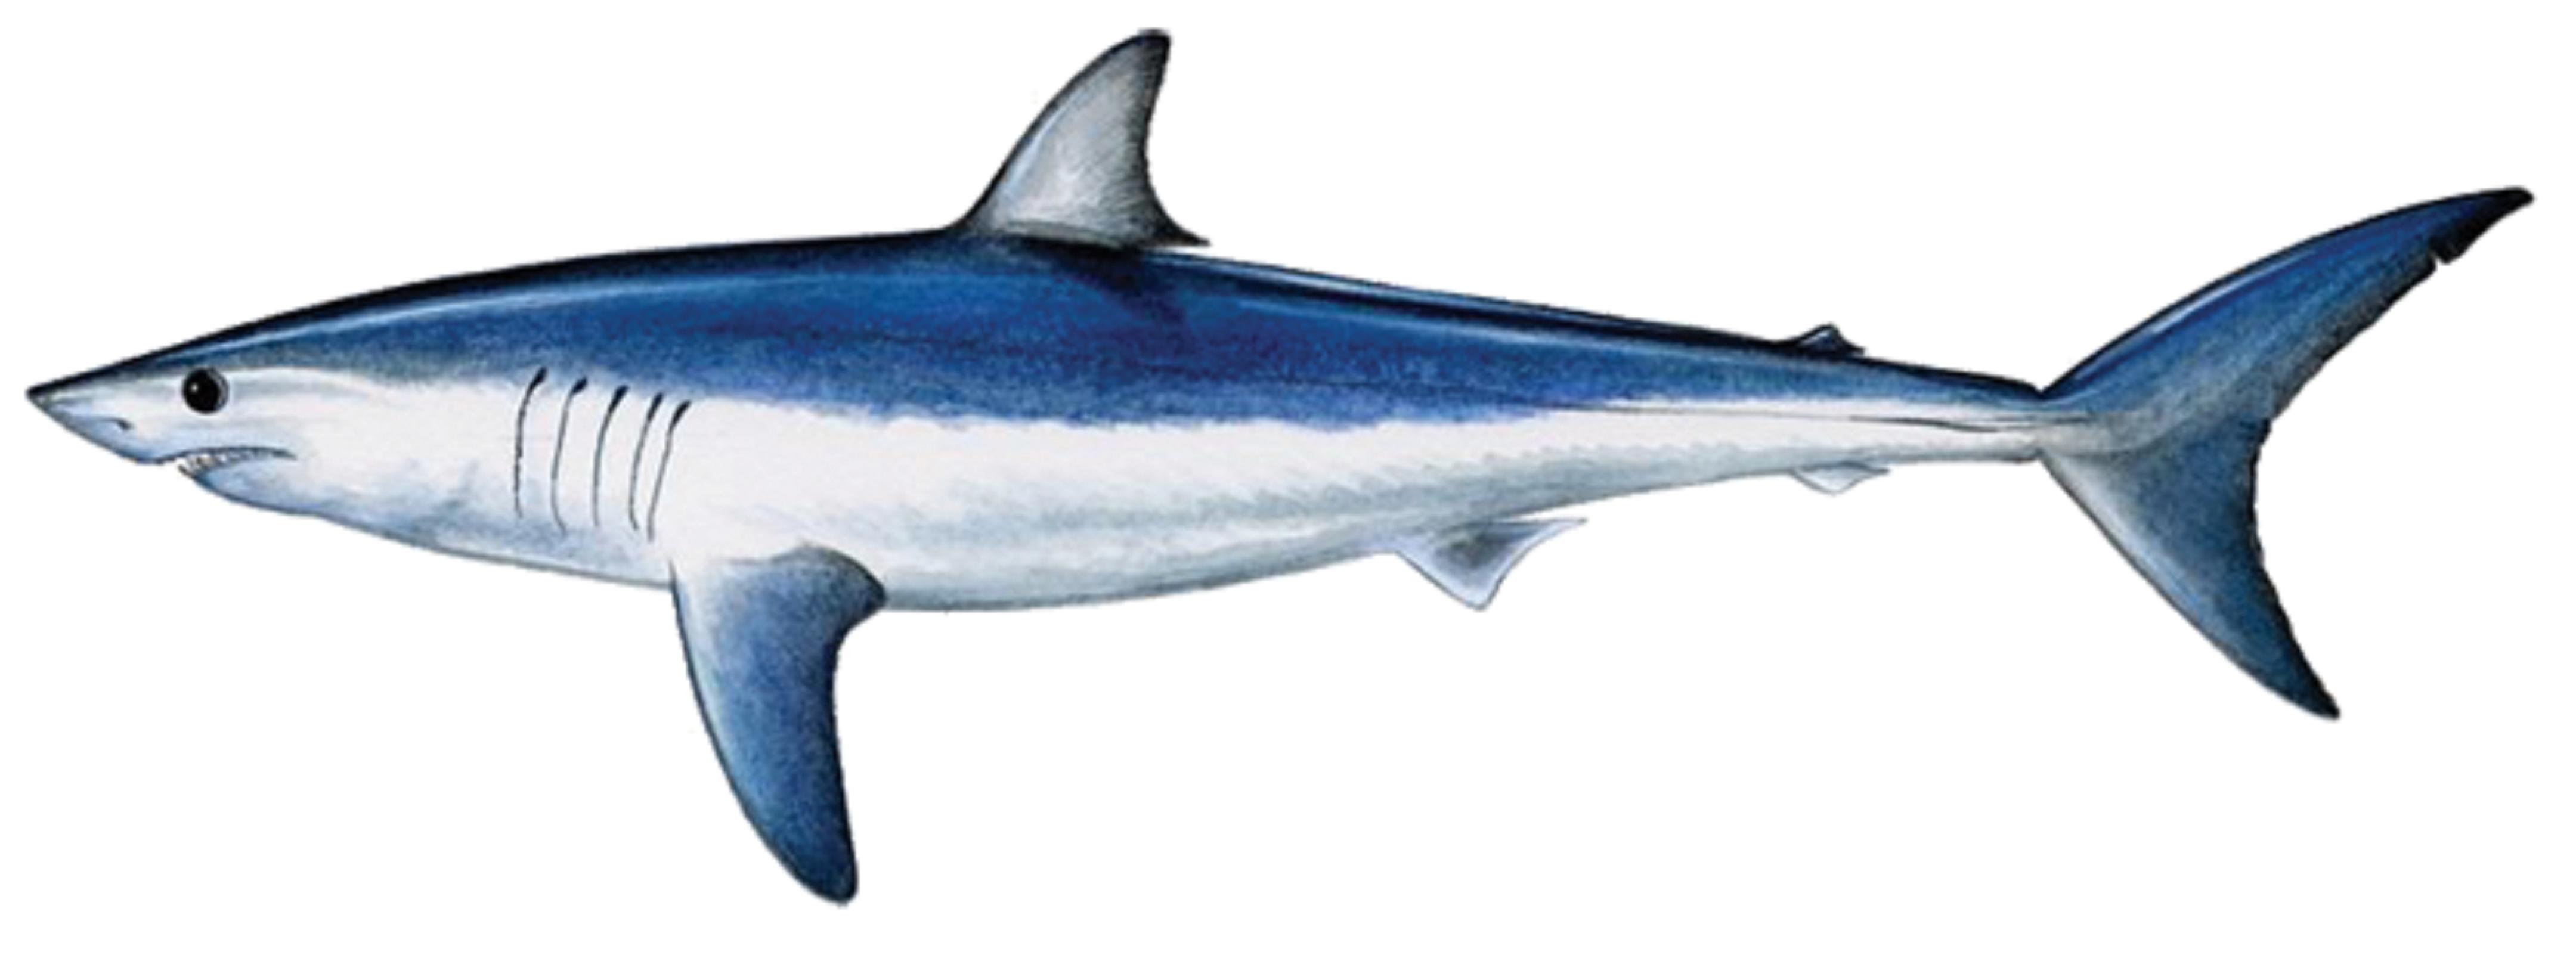 Art illustration oceans seas mako shark isurus for How to shark fish